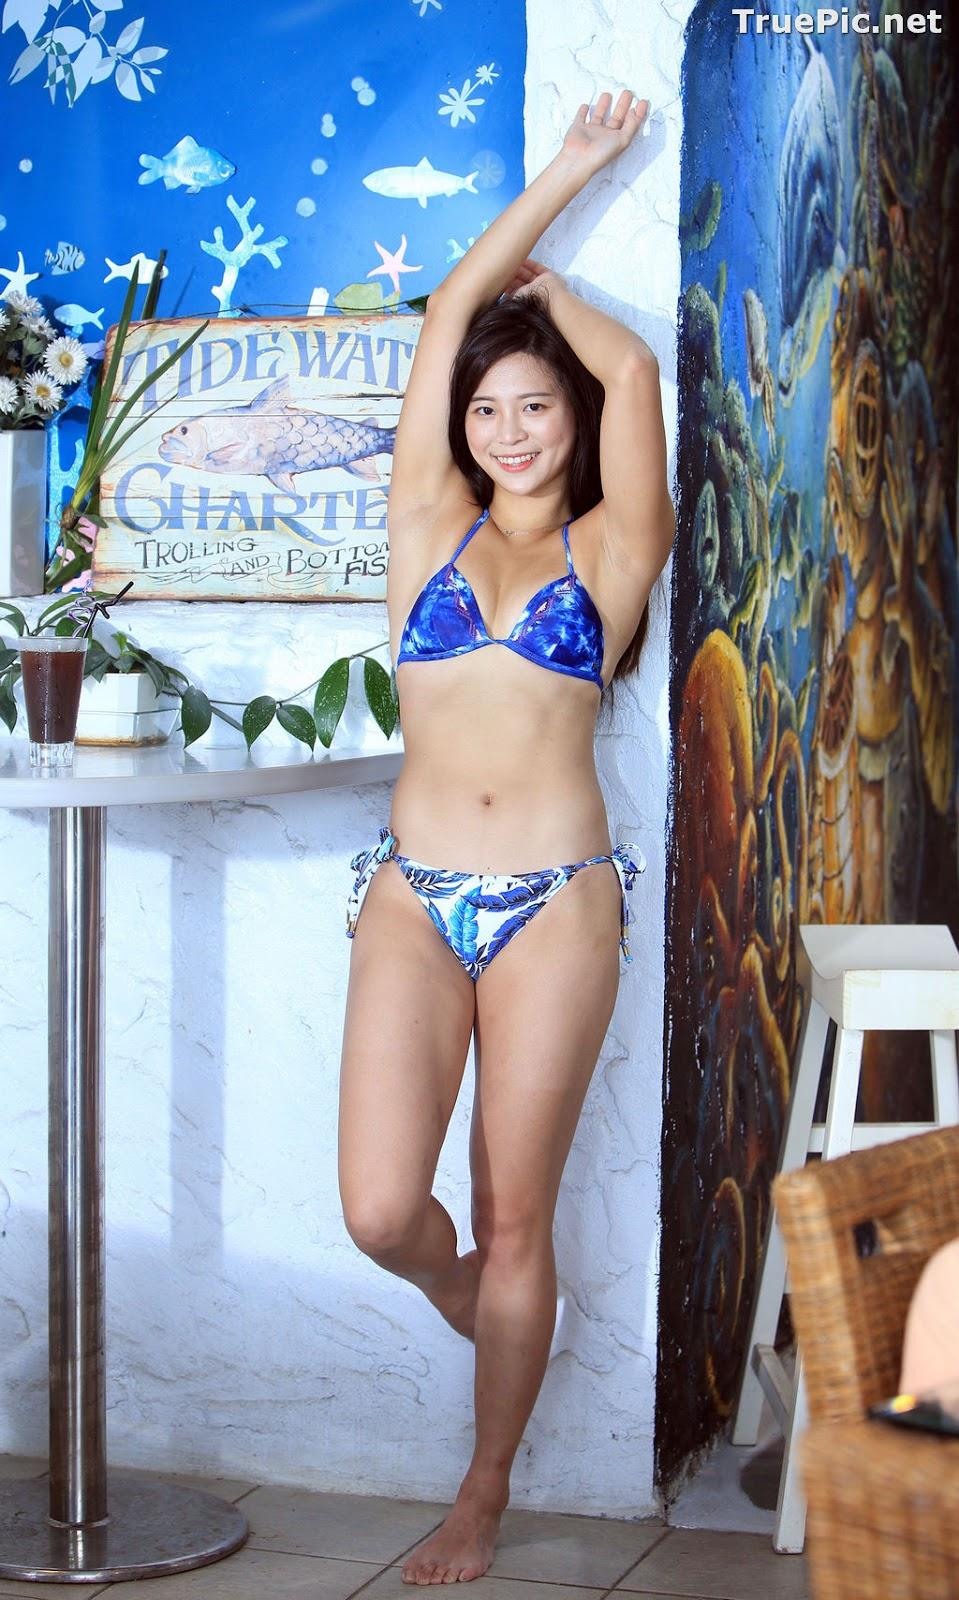 Image Taiwanese Model - Shelly - Beautiful Bodybuilding Bikini Girl - TruePic.net - Picture-56